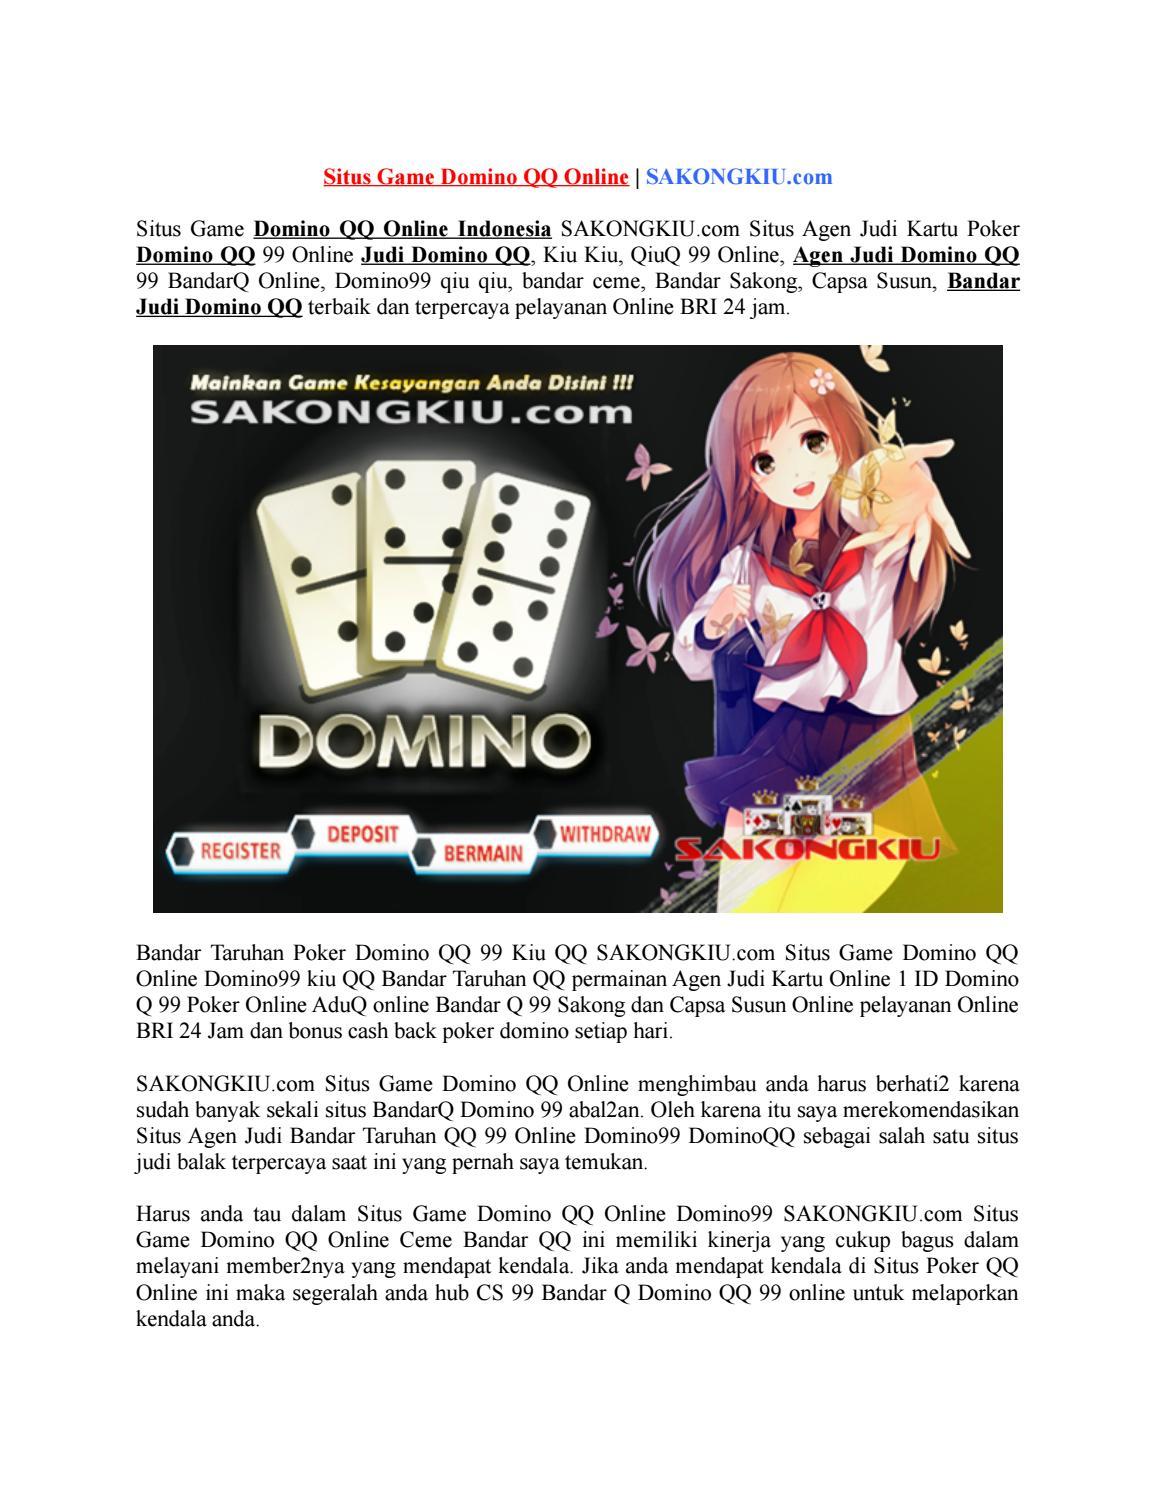 Situs Game Domino Qq Online Sakongkiu Com By Una Luna Issuu